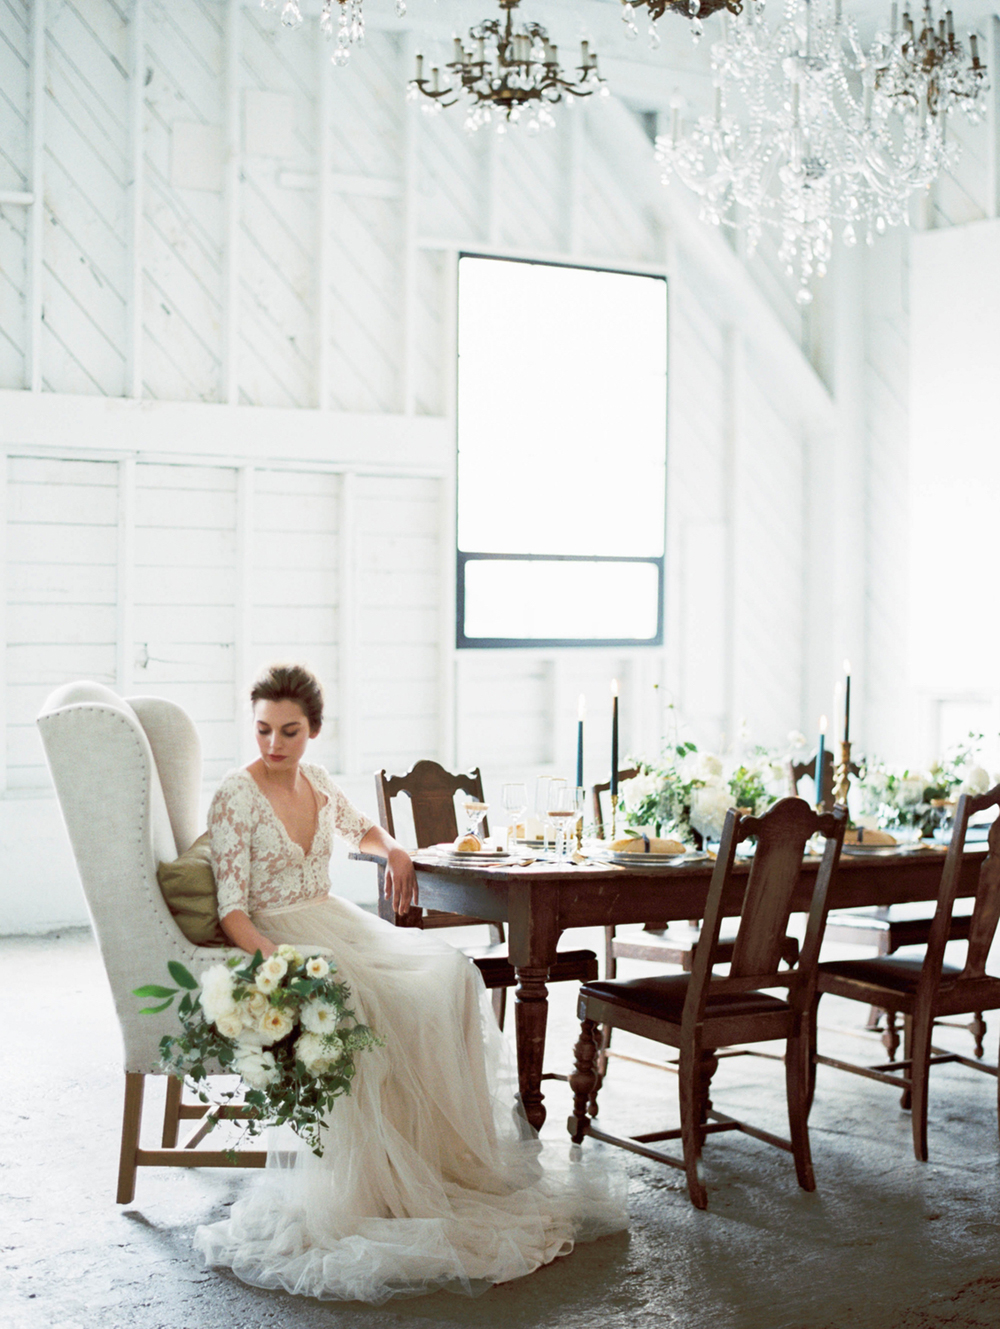 Organic Lush Wedding Inspiration with Elegant Details - photo by Maria Lamb https://ruffledblog.com/organic-lush-wedding-inspiration-with-elegant-details